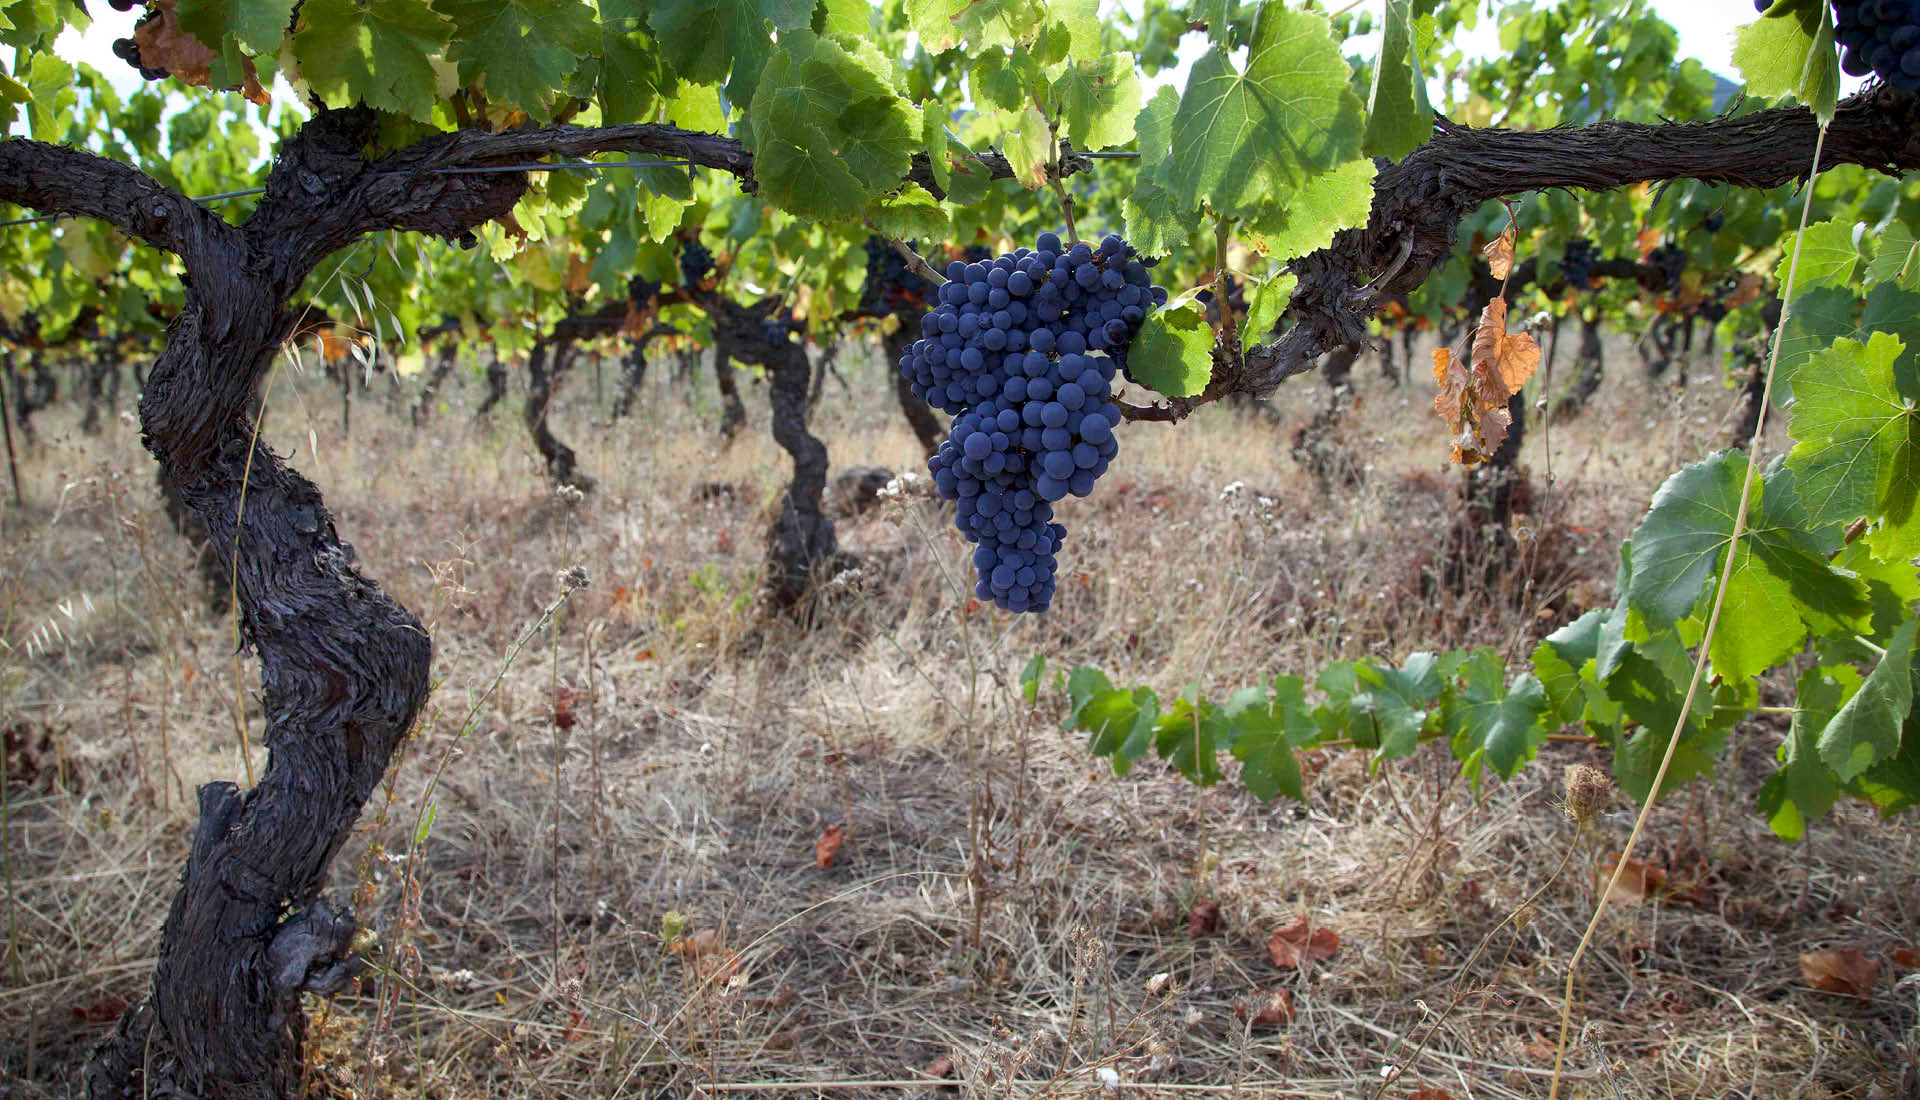 Cultures viticoles Grand Site Salagou © L.Micola 5